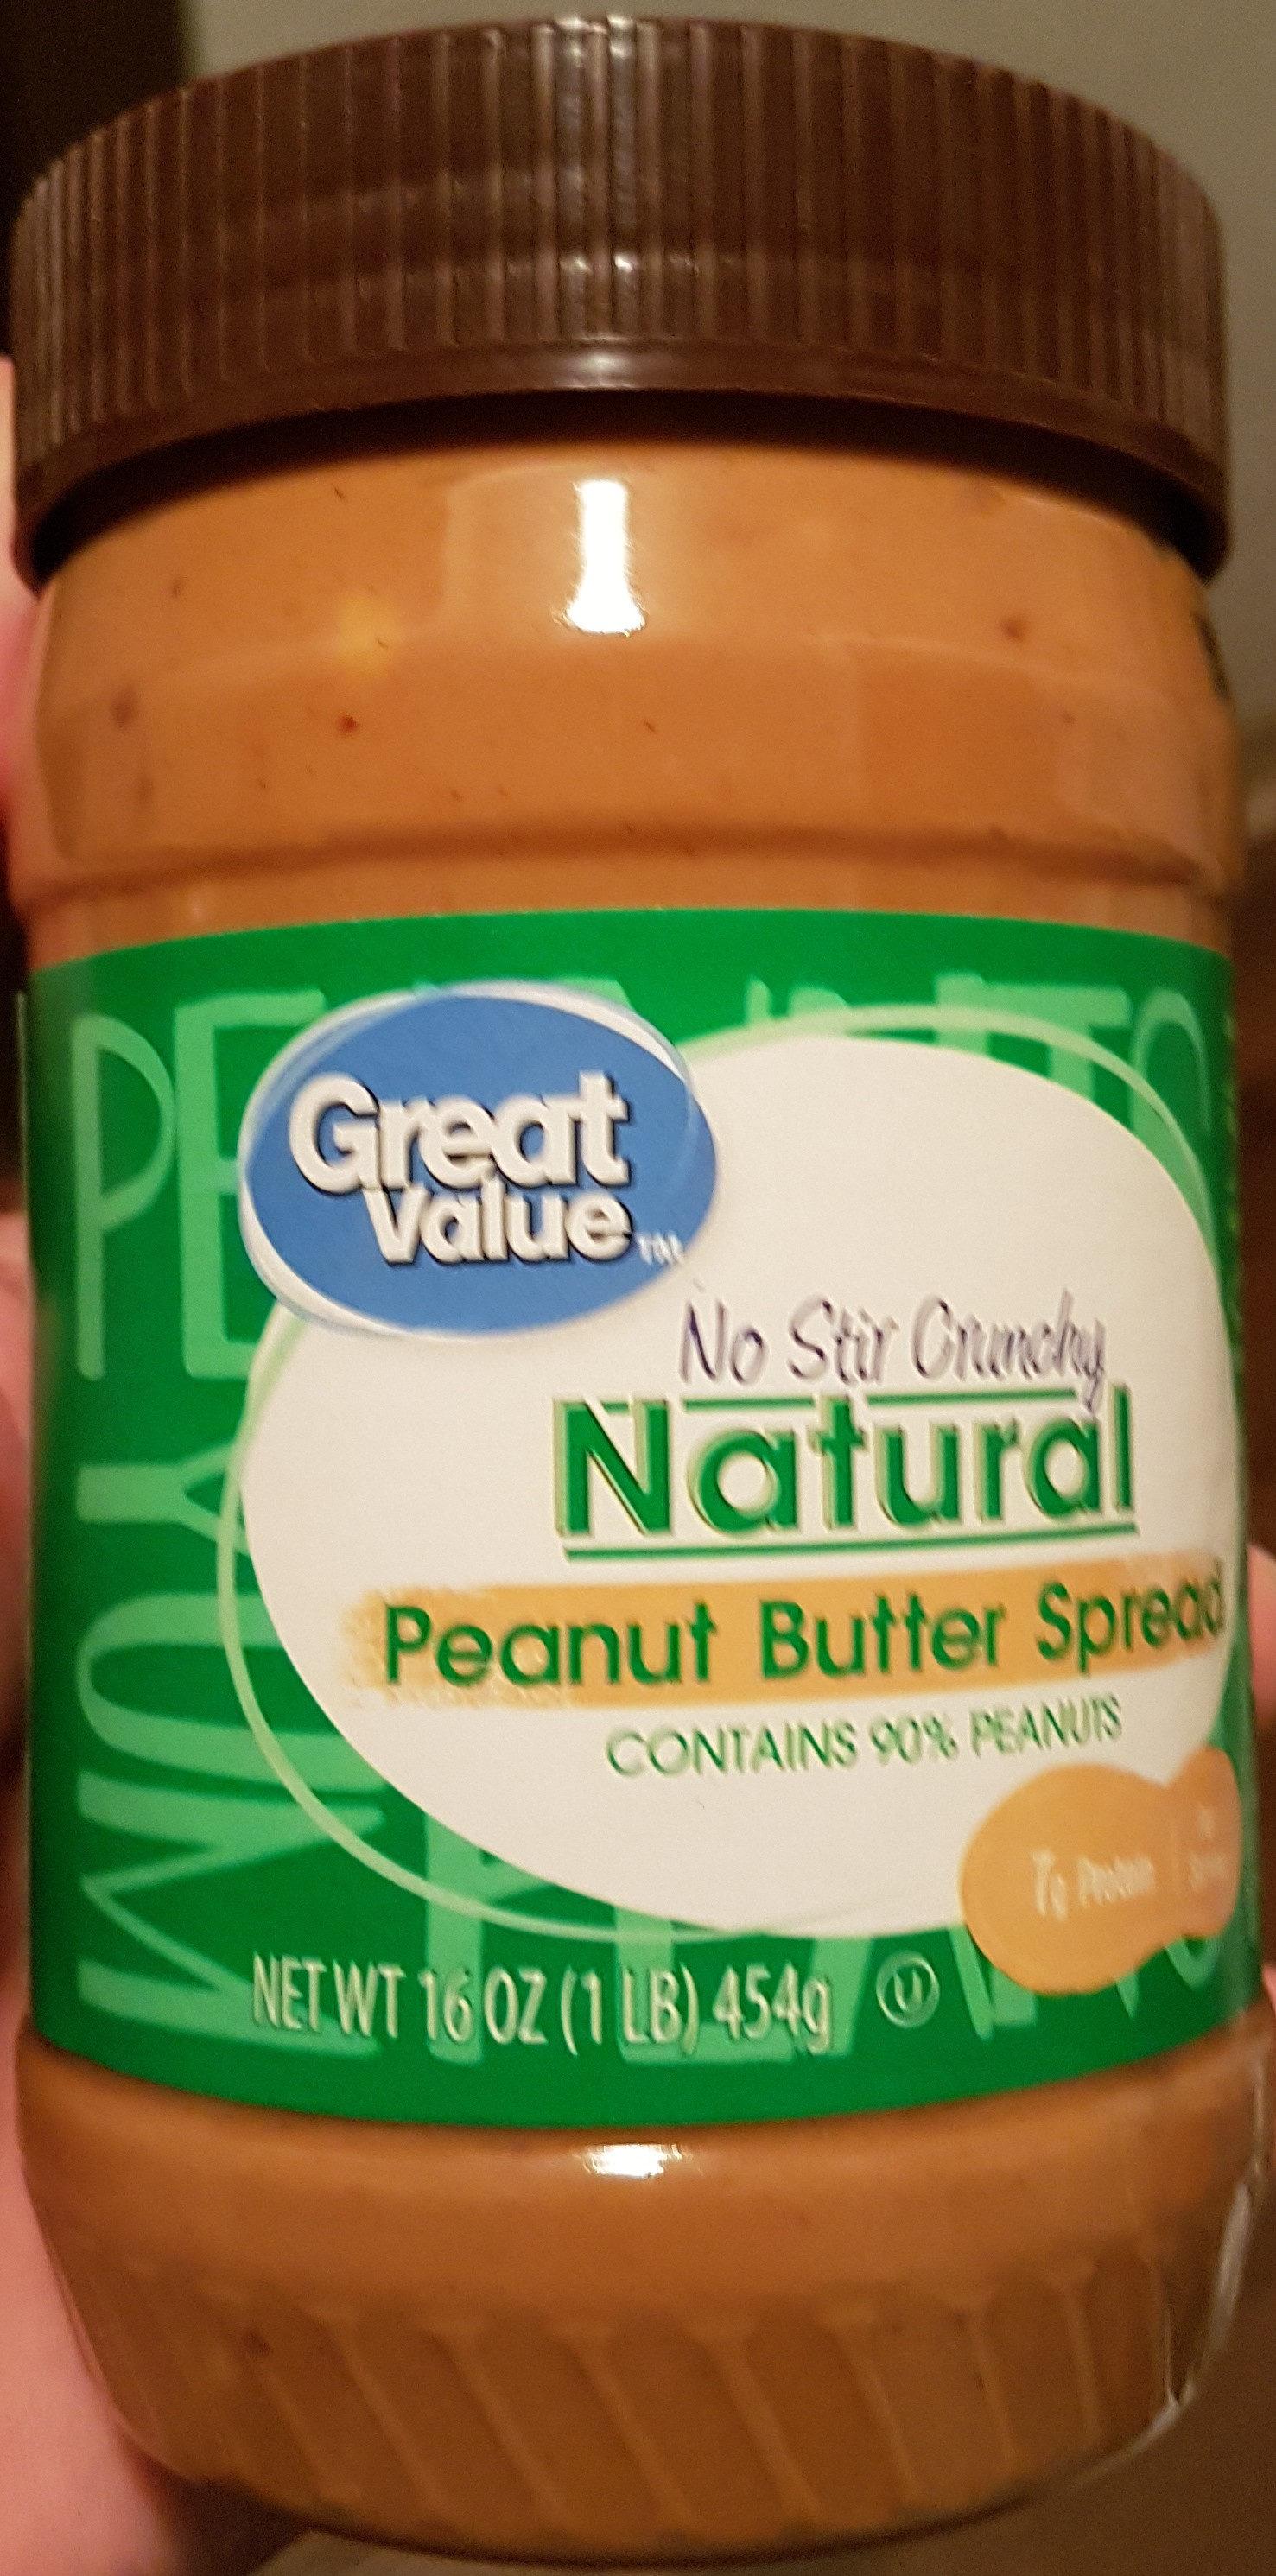 Natural Peanut Butter Spread - Product - en